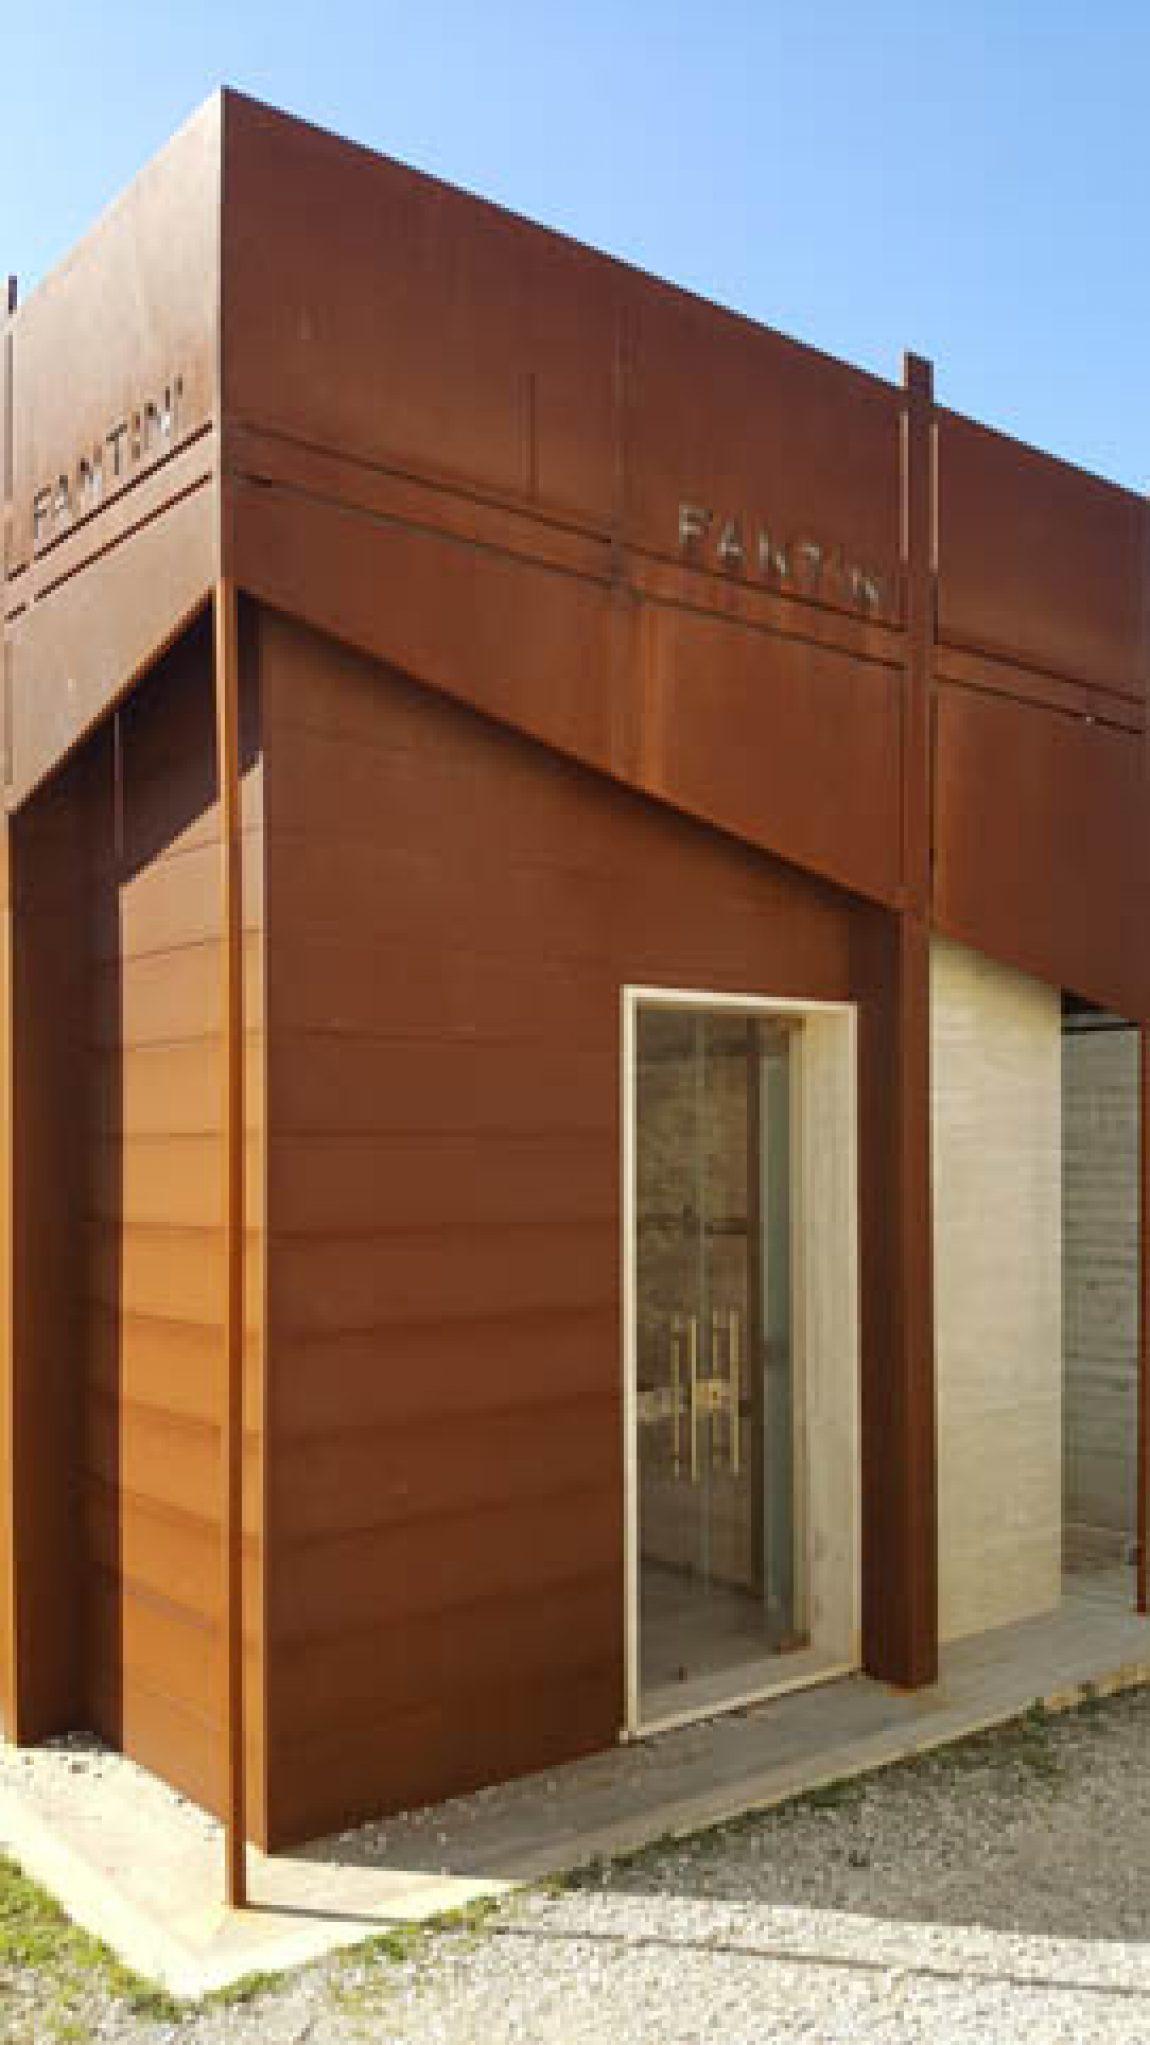 Cappella Funeraria Fantini Tivoli 04-4